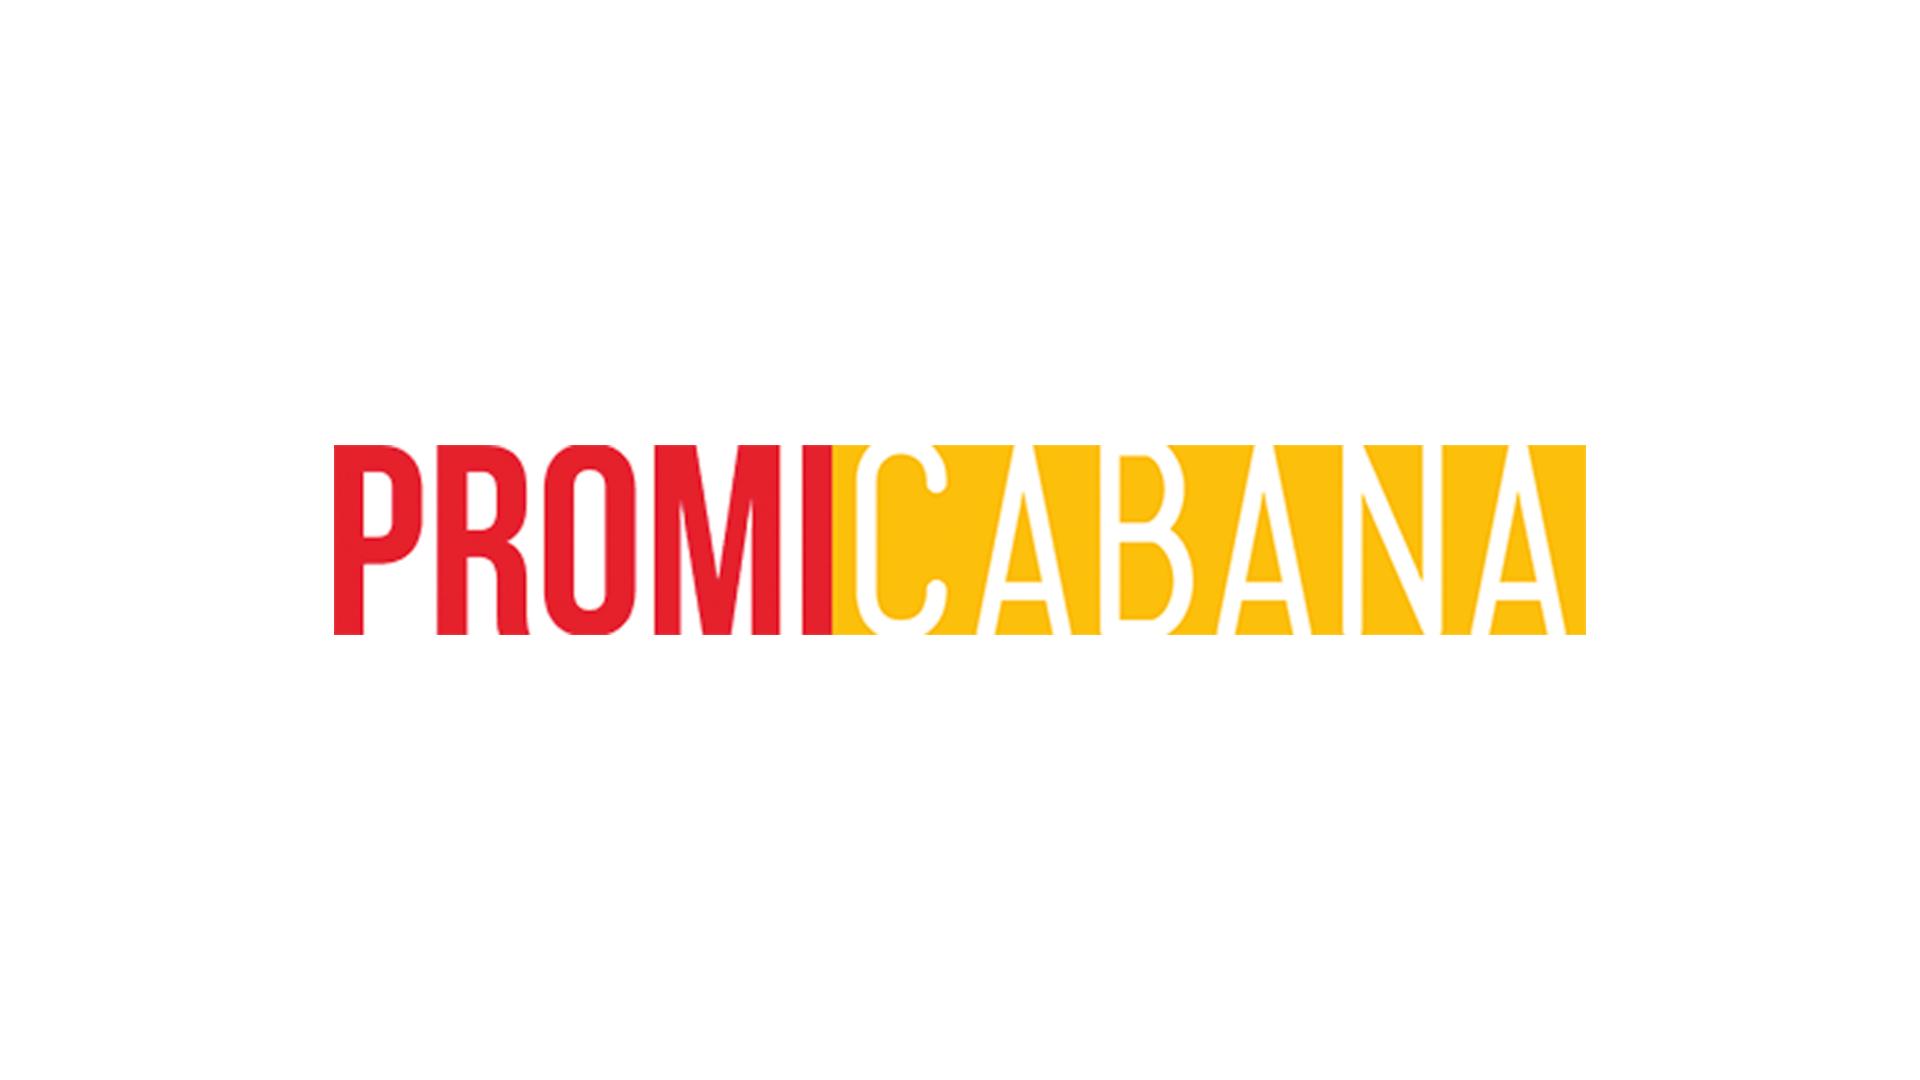 Carl-Philip-Sofia-Hellqvist-Hochzeitskuss